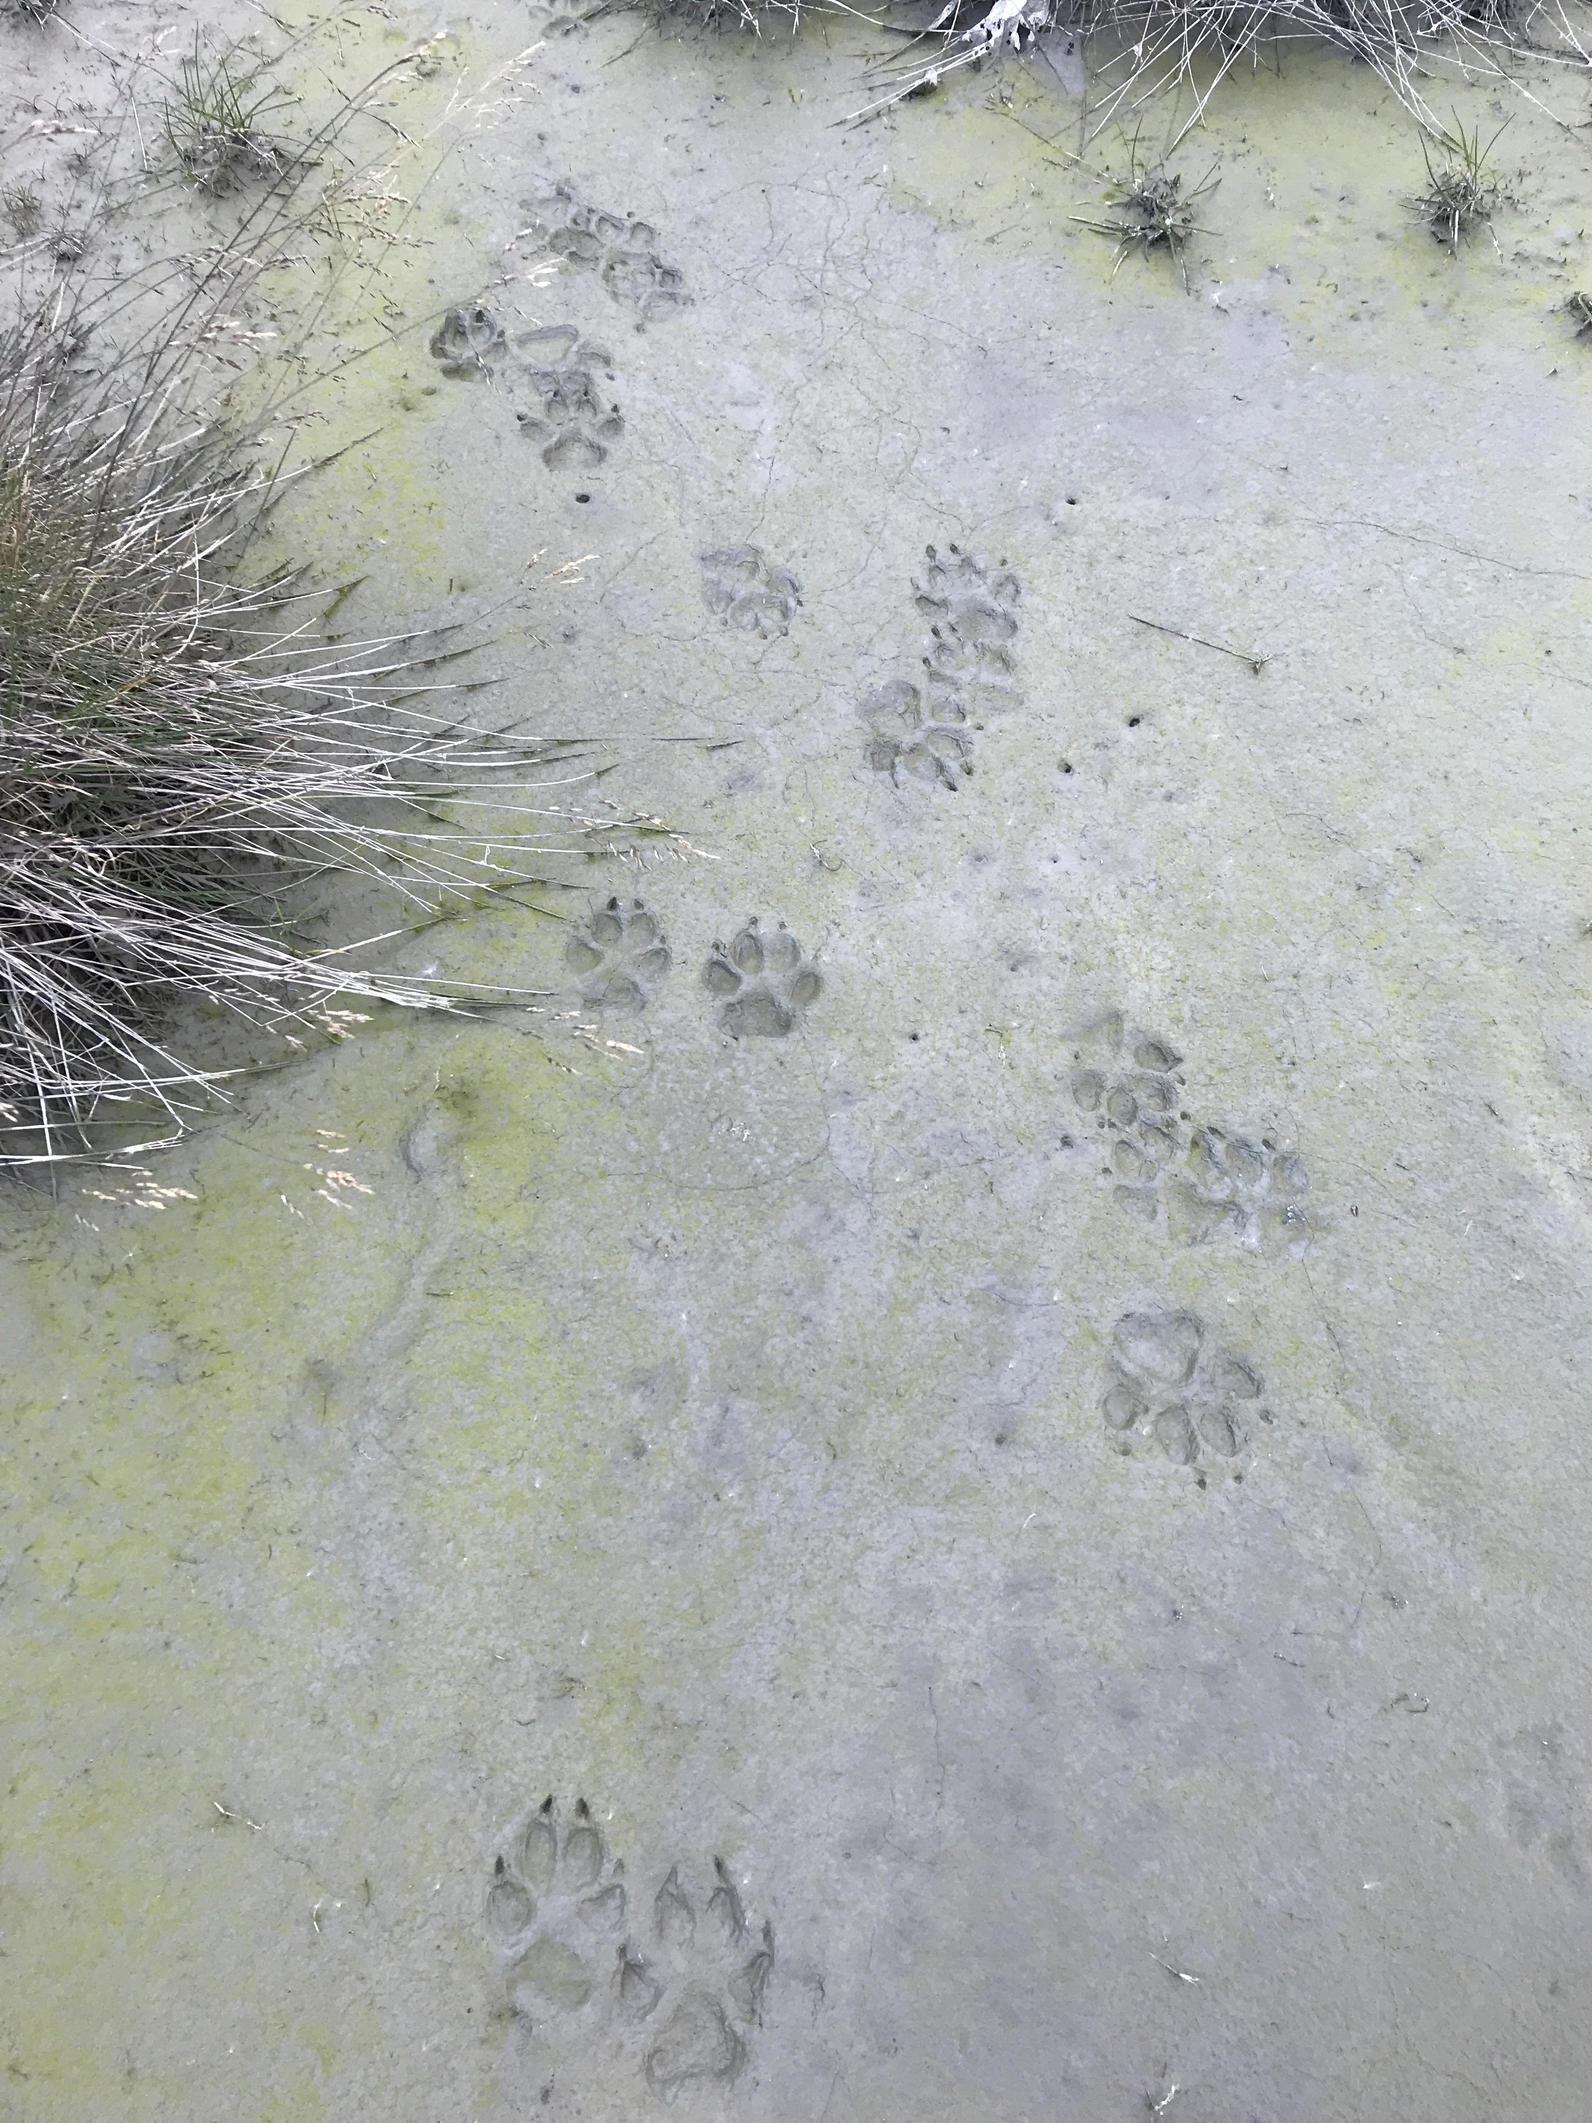 The Alexander Archipelago Wolf is a regionally distinct species found in Southeast Alaska.